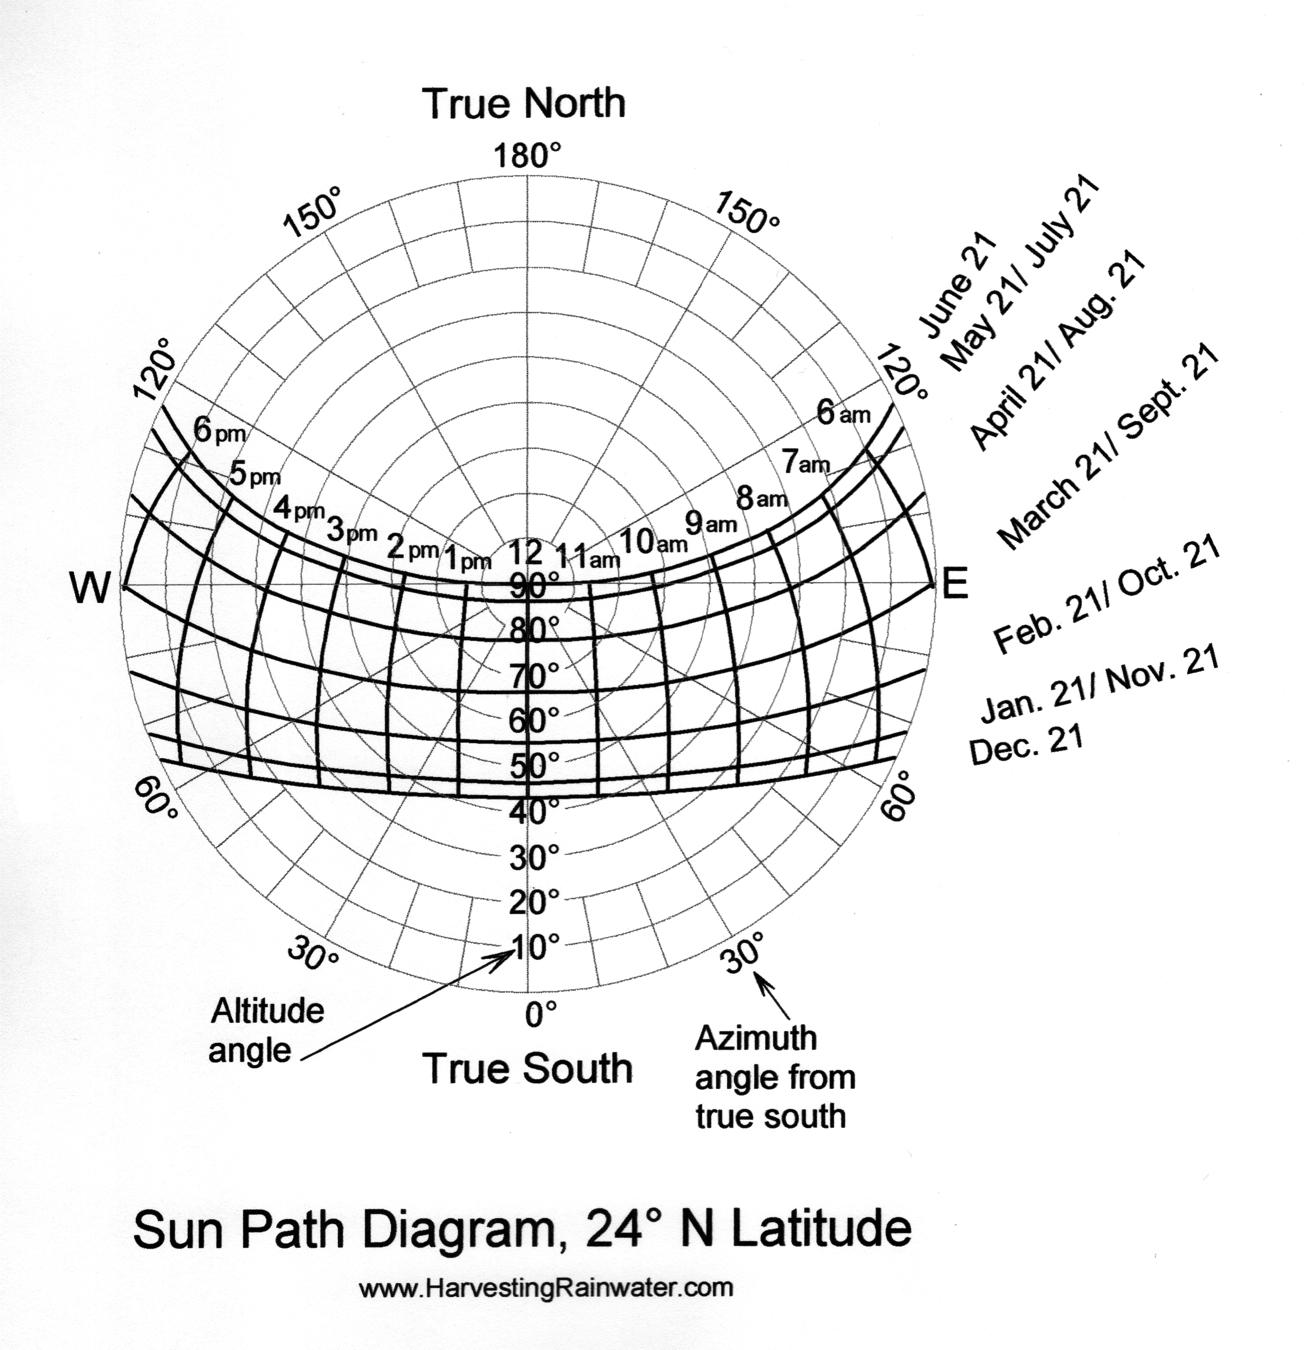 Sun Path Diagram 24o N Latitude